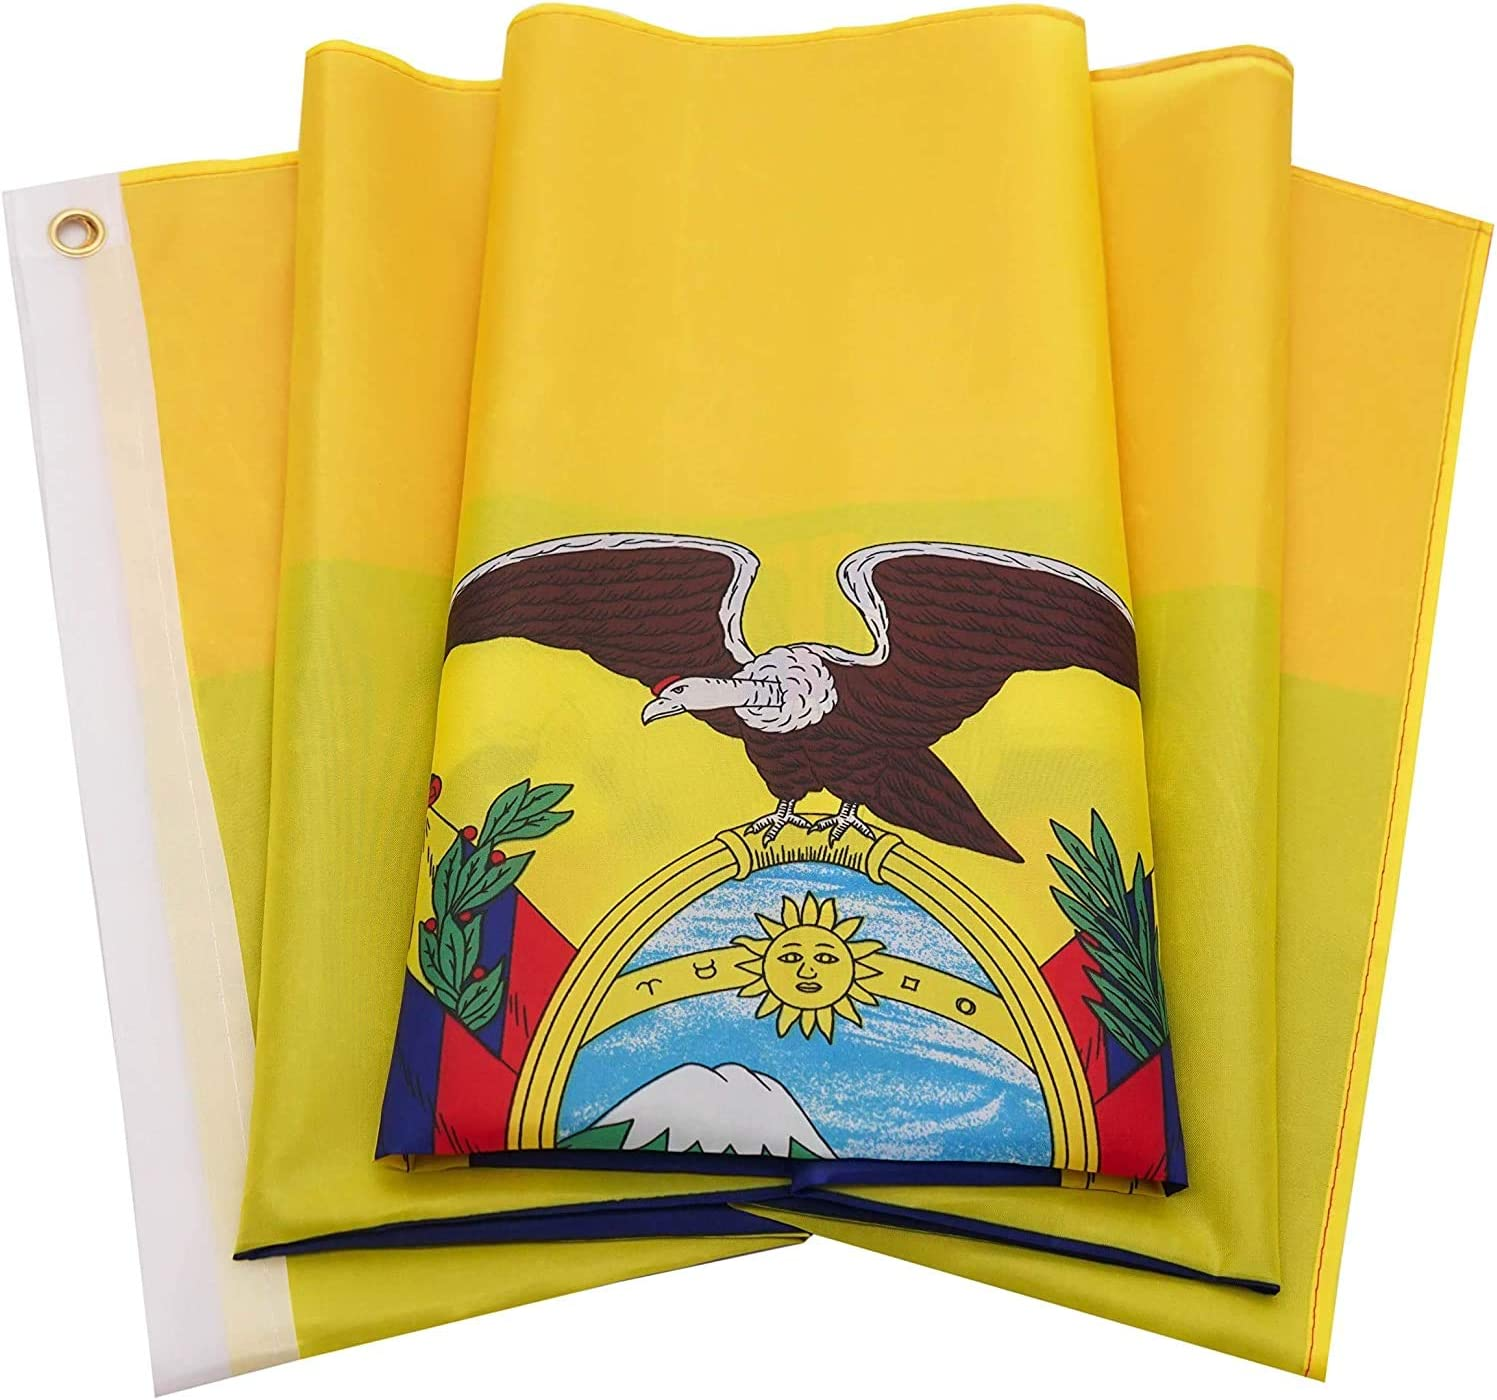 Ericraft Bandera ecuatoriana Grande 90x150cms Bandera de Ecuador de balcón para Exterior Reforzada y con 2 Ojales metálicos, Bandera Ecuador Tela: Amazon.es: Jardín